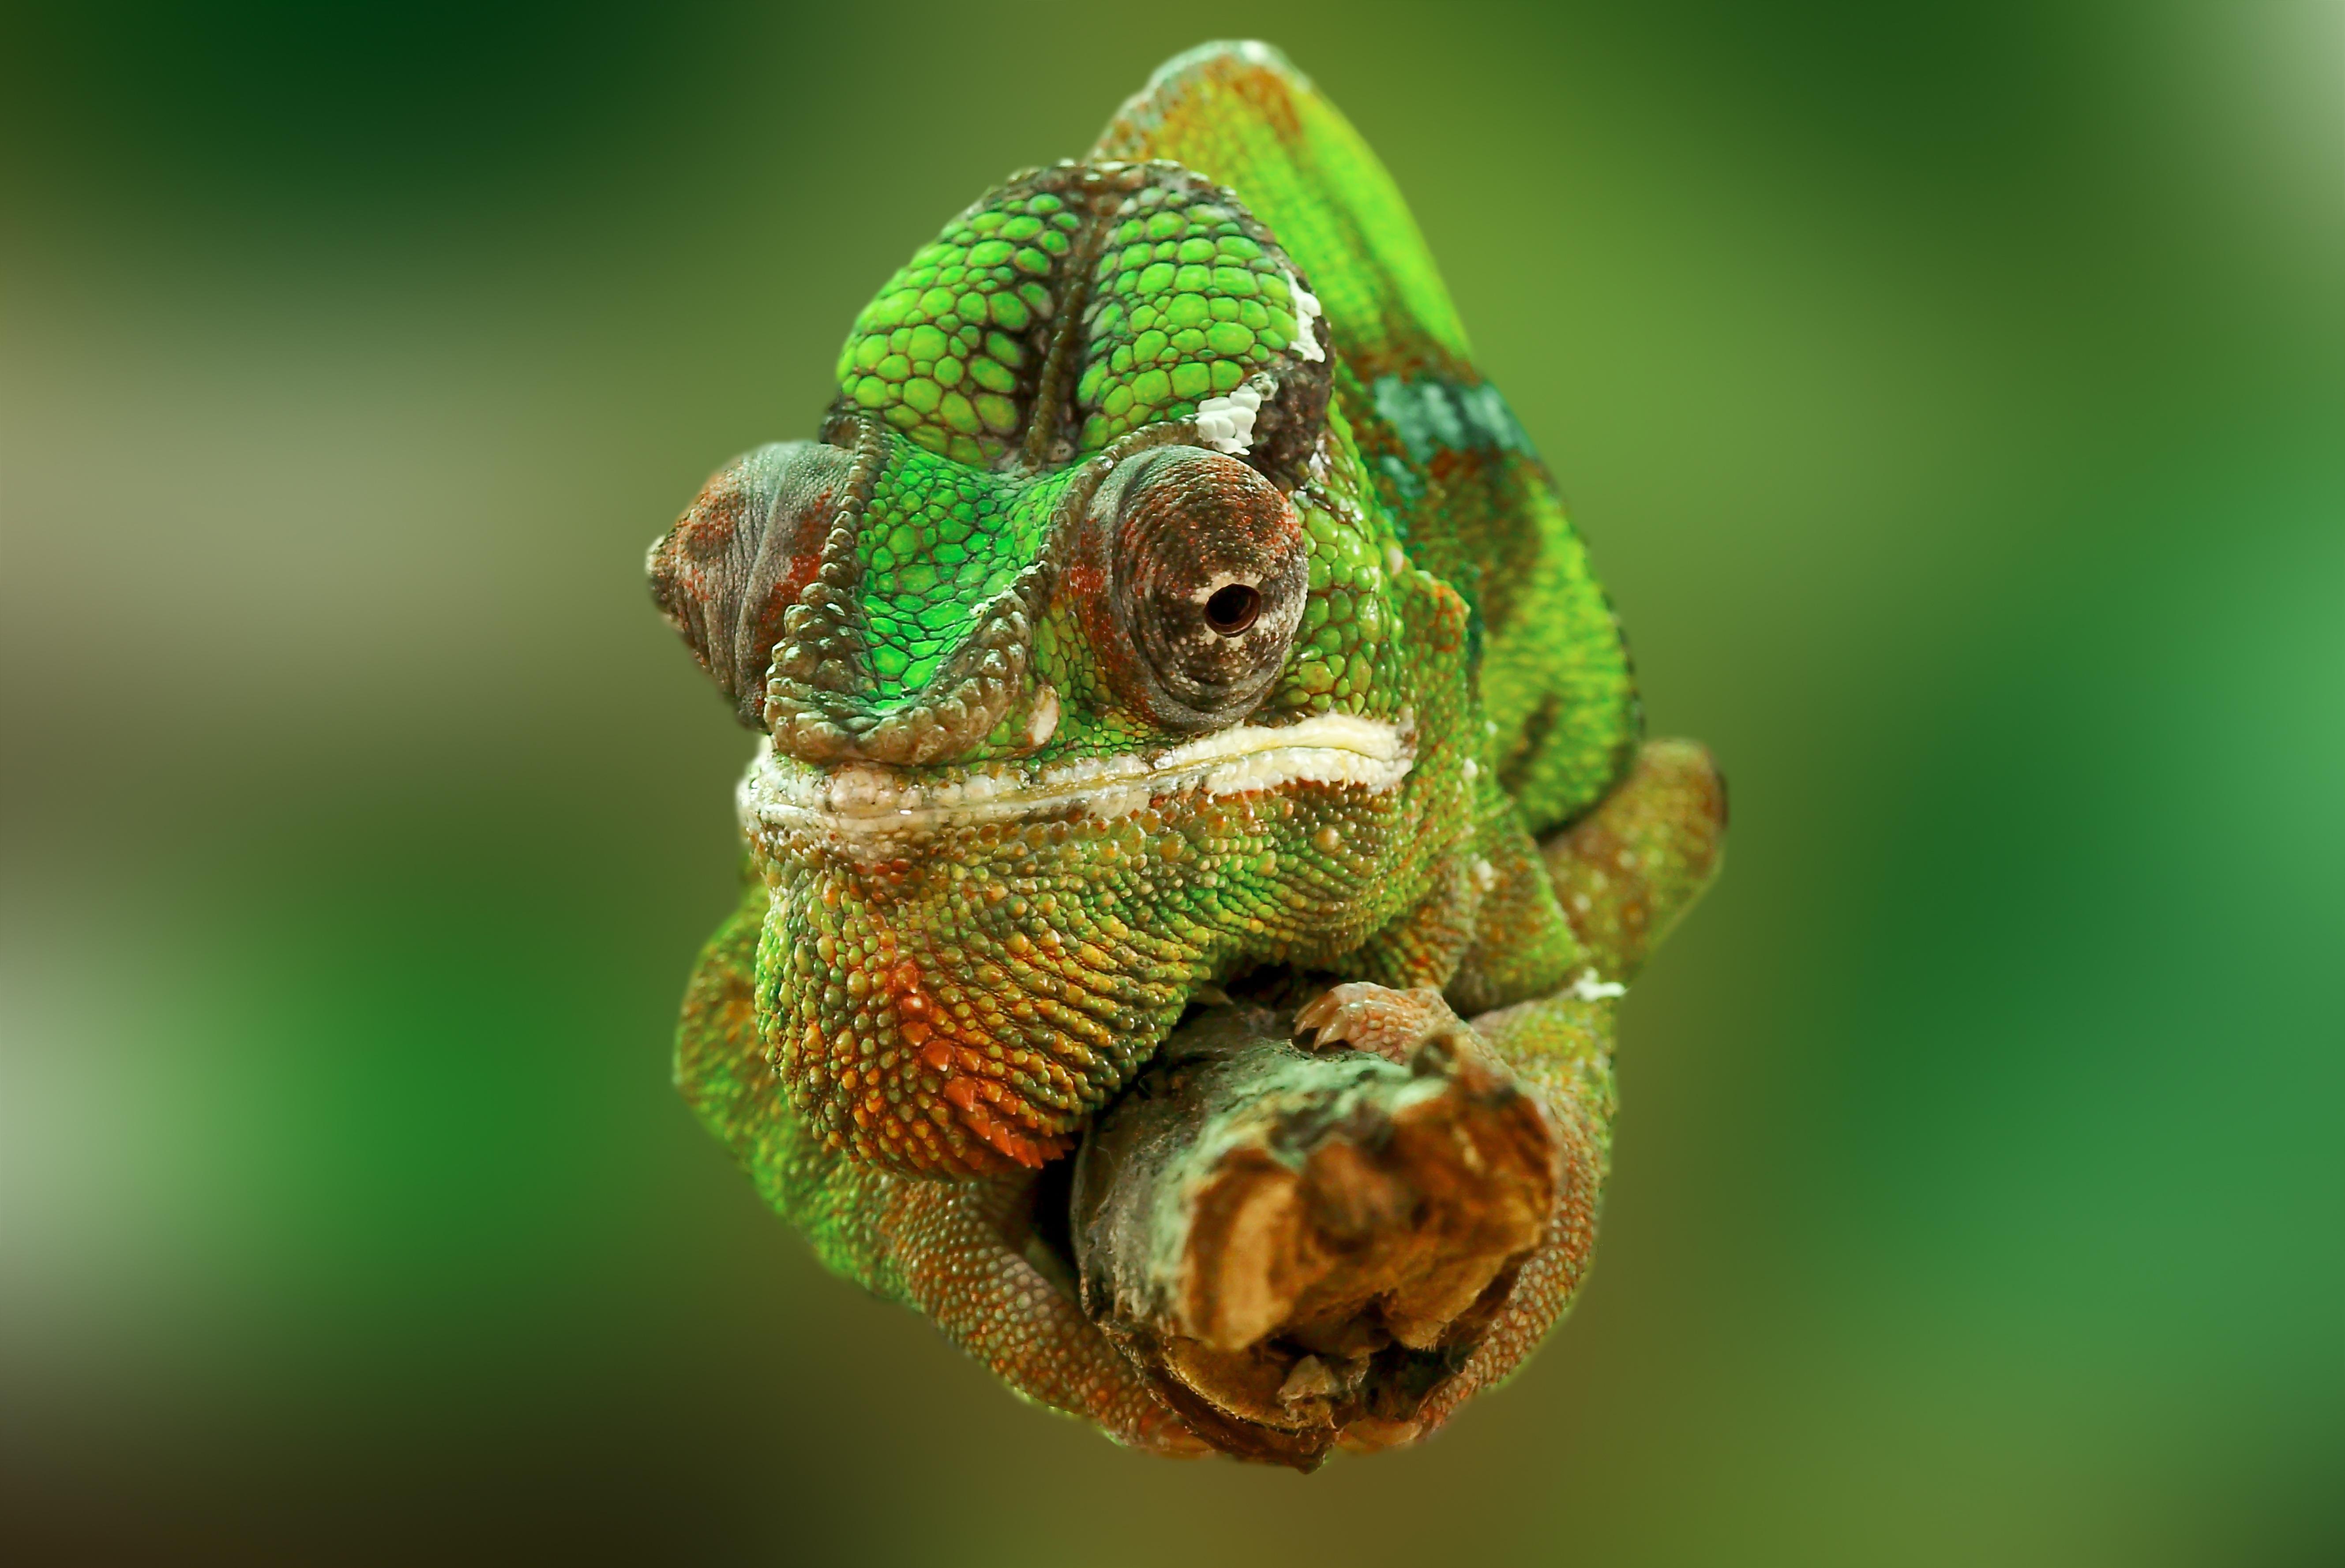 close up of chameleon treated at Wellesley Exotic Pet Vet Richmond, VA